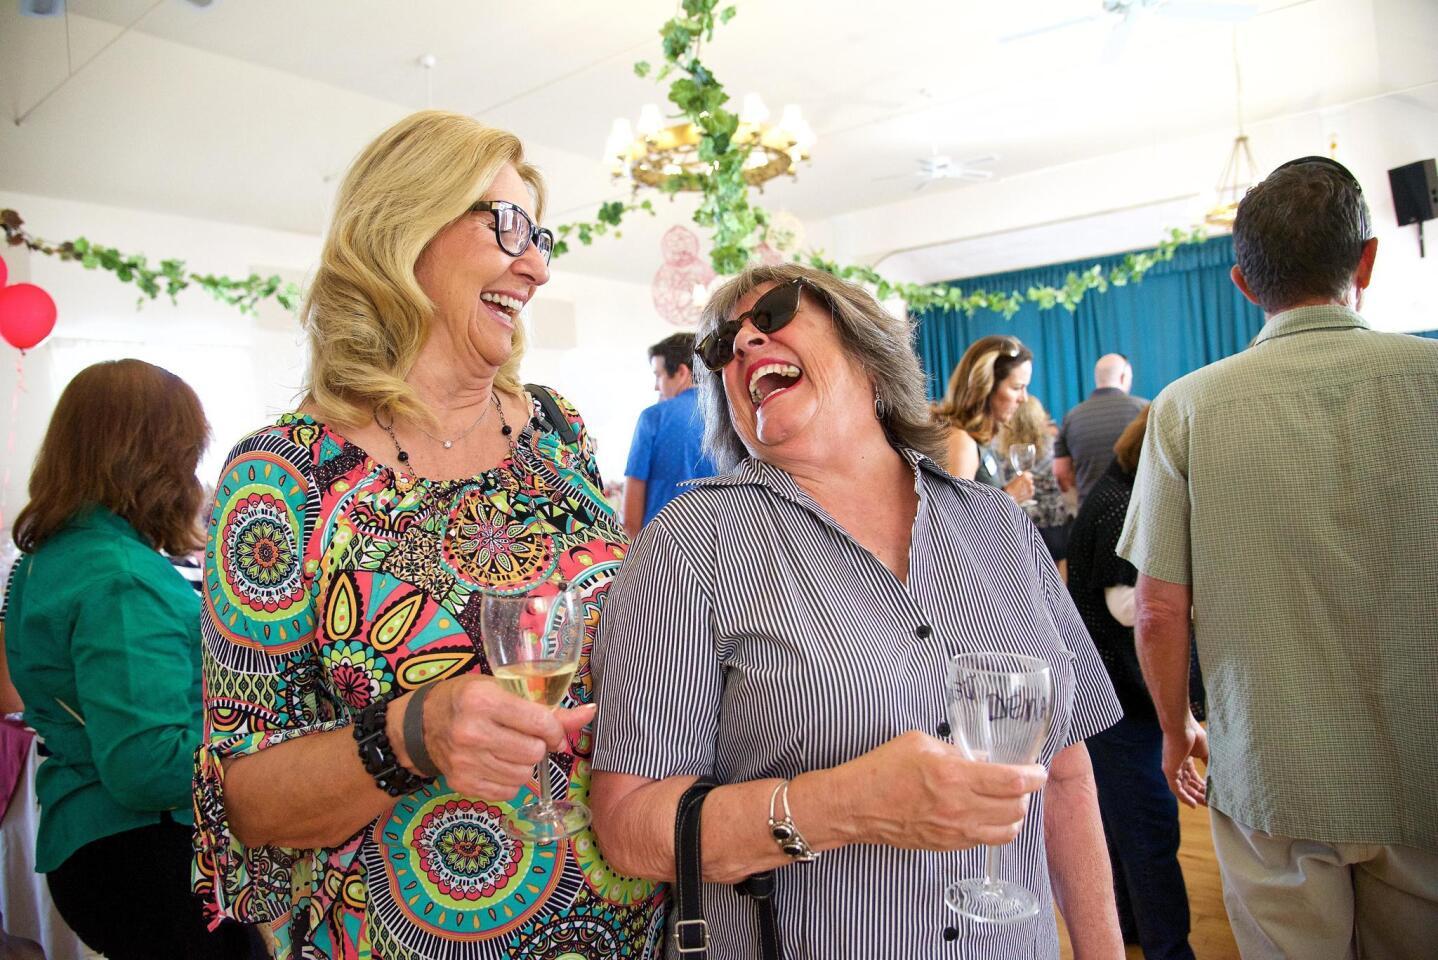 Janice Carrizosa and Denay Wilson share a laugh.